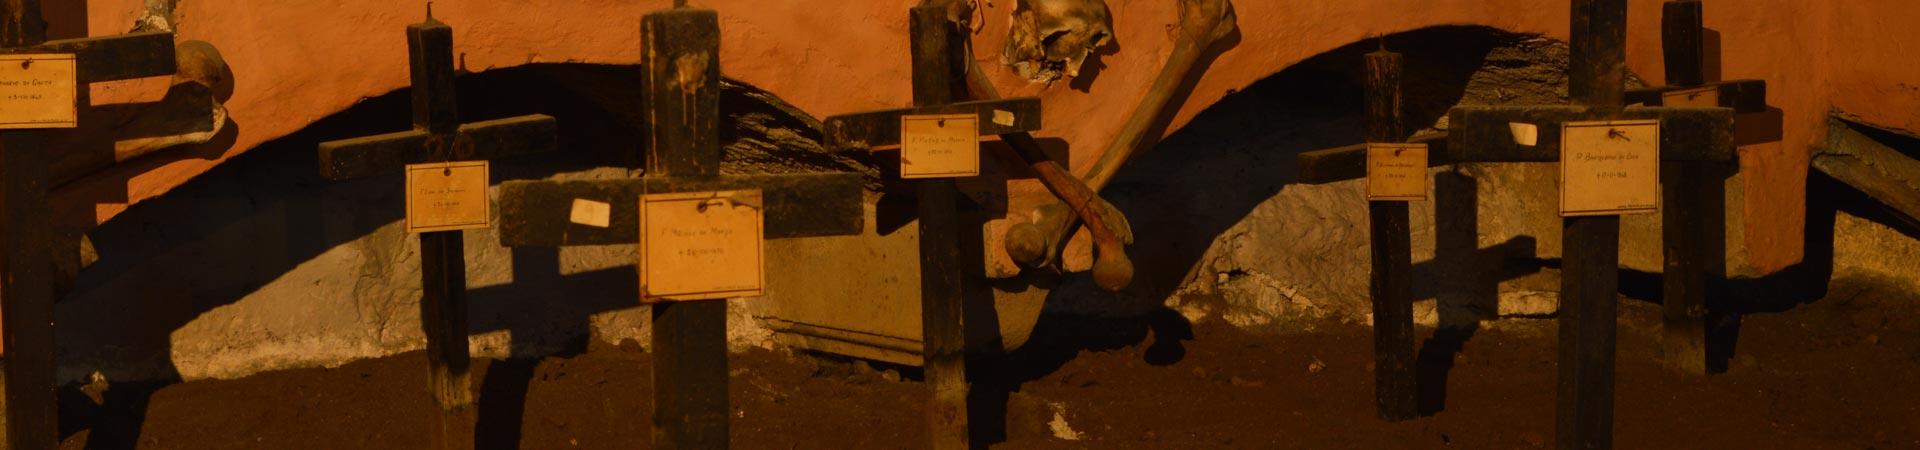 capuchin crypts bone chapels image 002